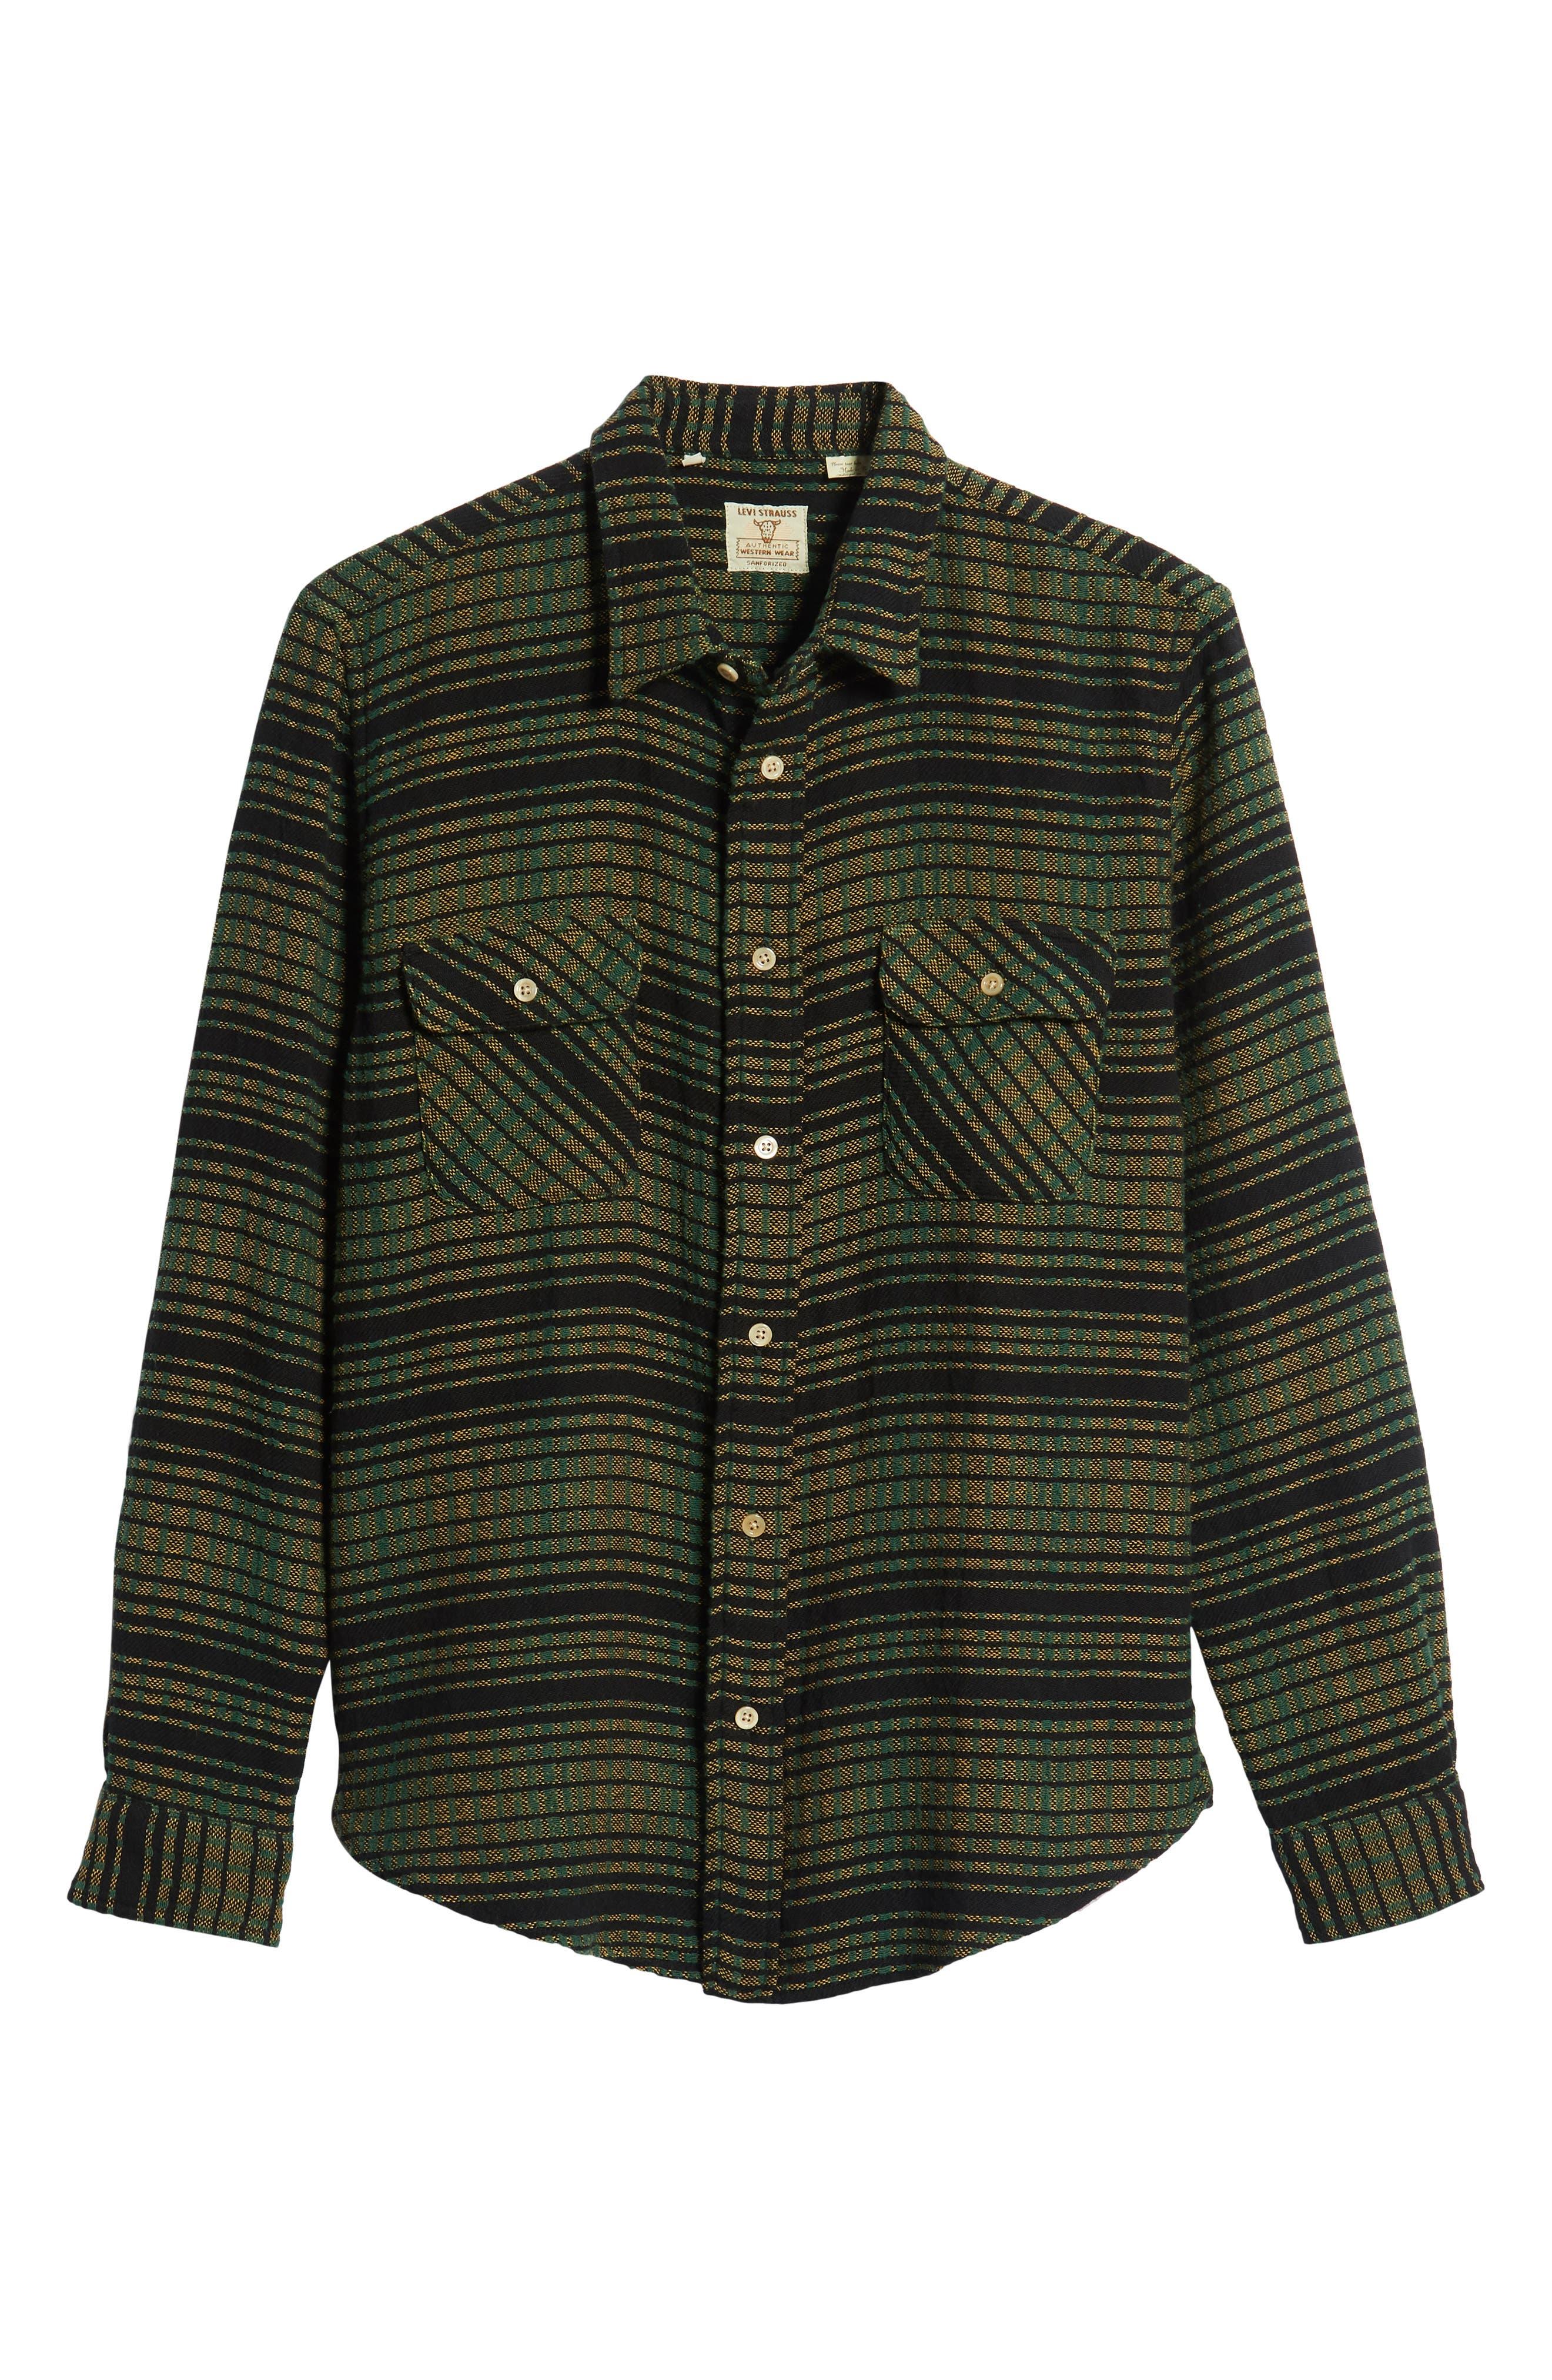 LEVI'S<SUP>®</SUP> VINTAGE CLOTHING,                             Shorthorn Slim Fit Sport Shirt,                             Alternate thumbnail 5, color,                             300